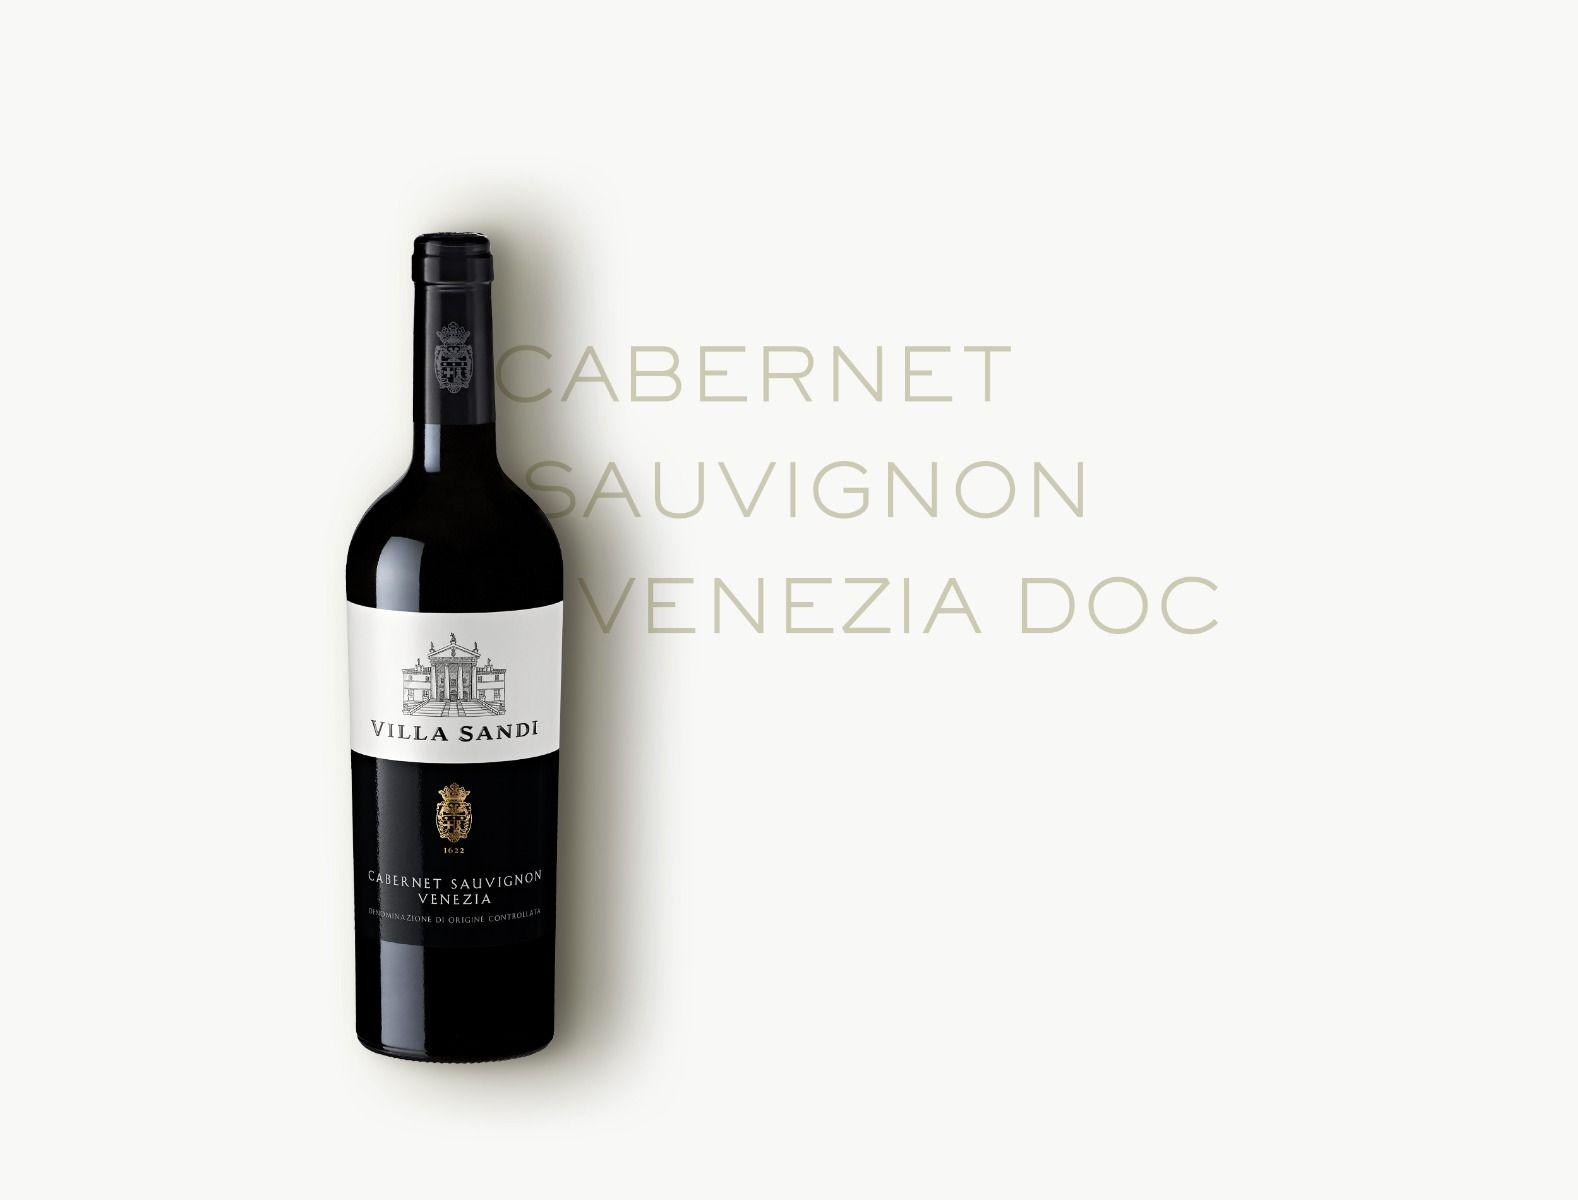 Cabernet Sauvignon Venezia DOC